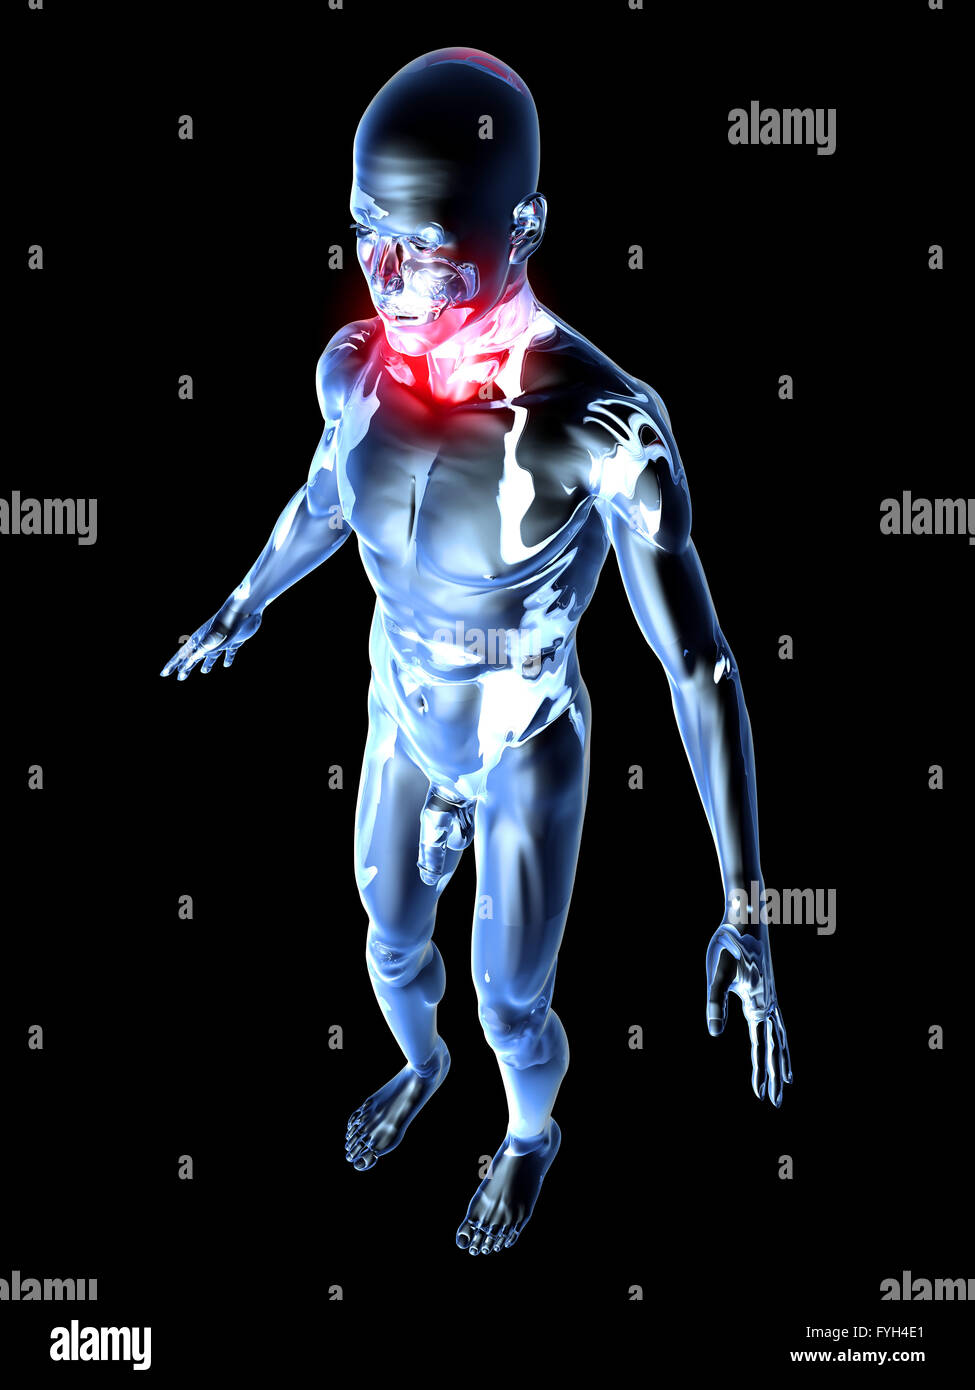 Sore Throat - Anatomy Stock Photo: 103024265 - Alamy